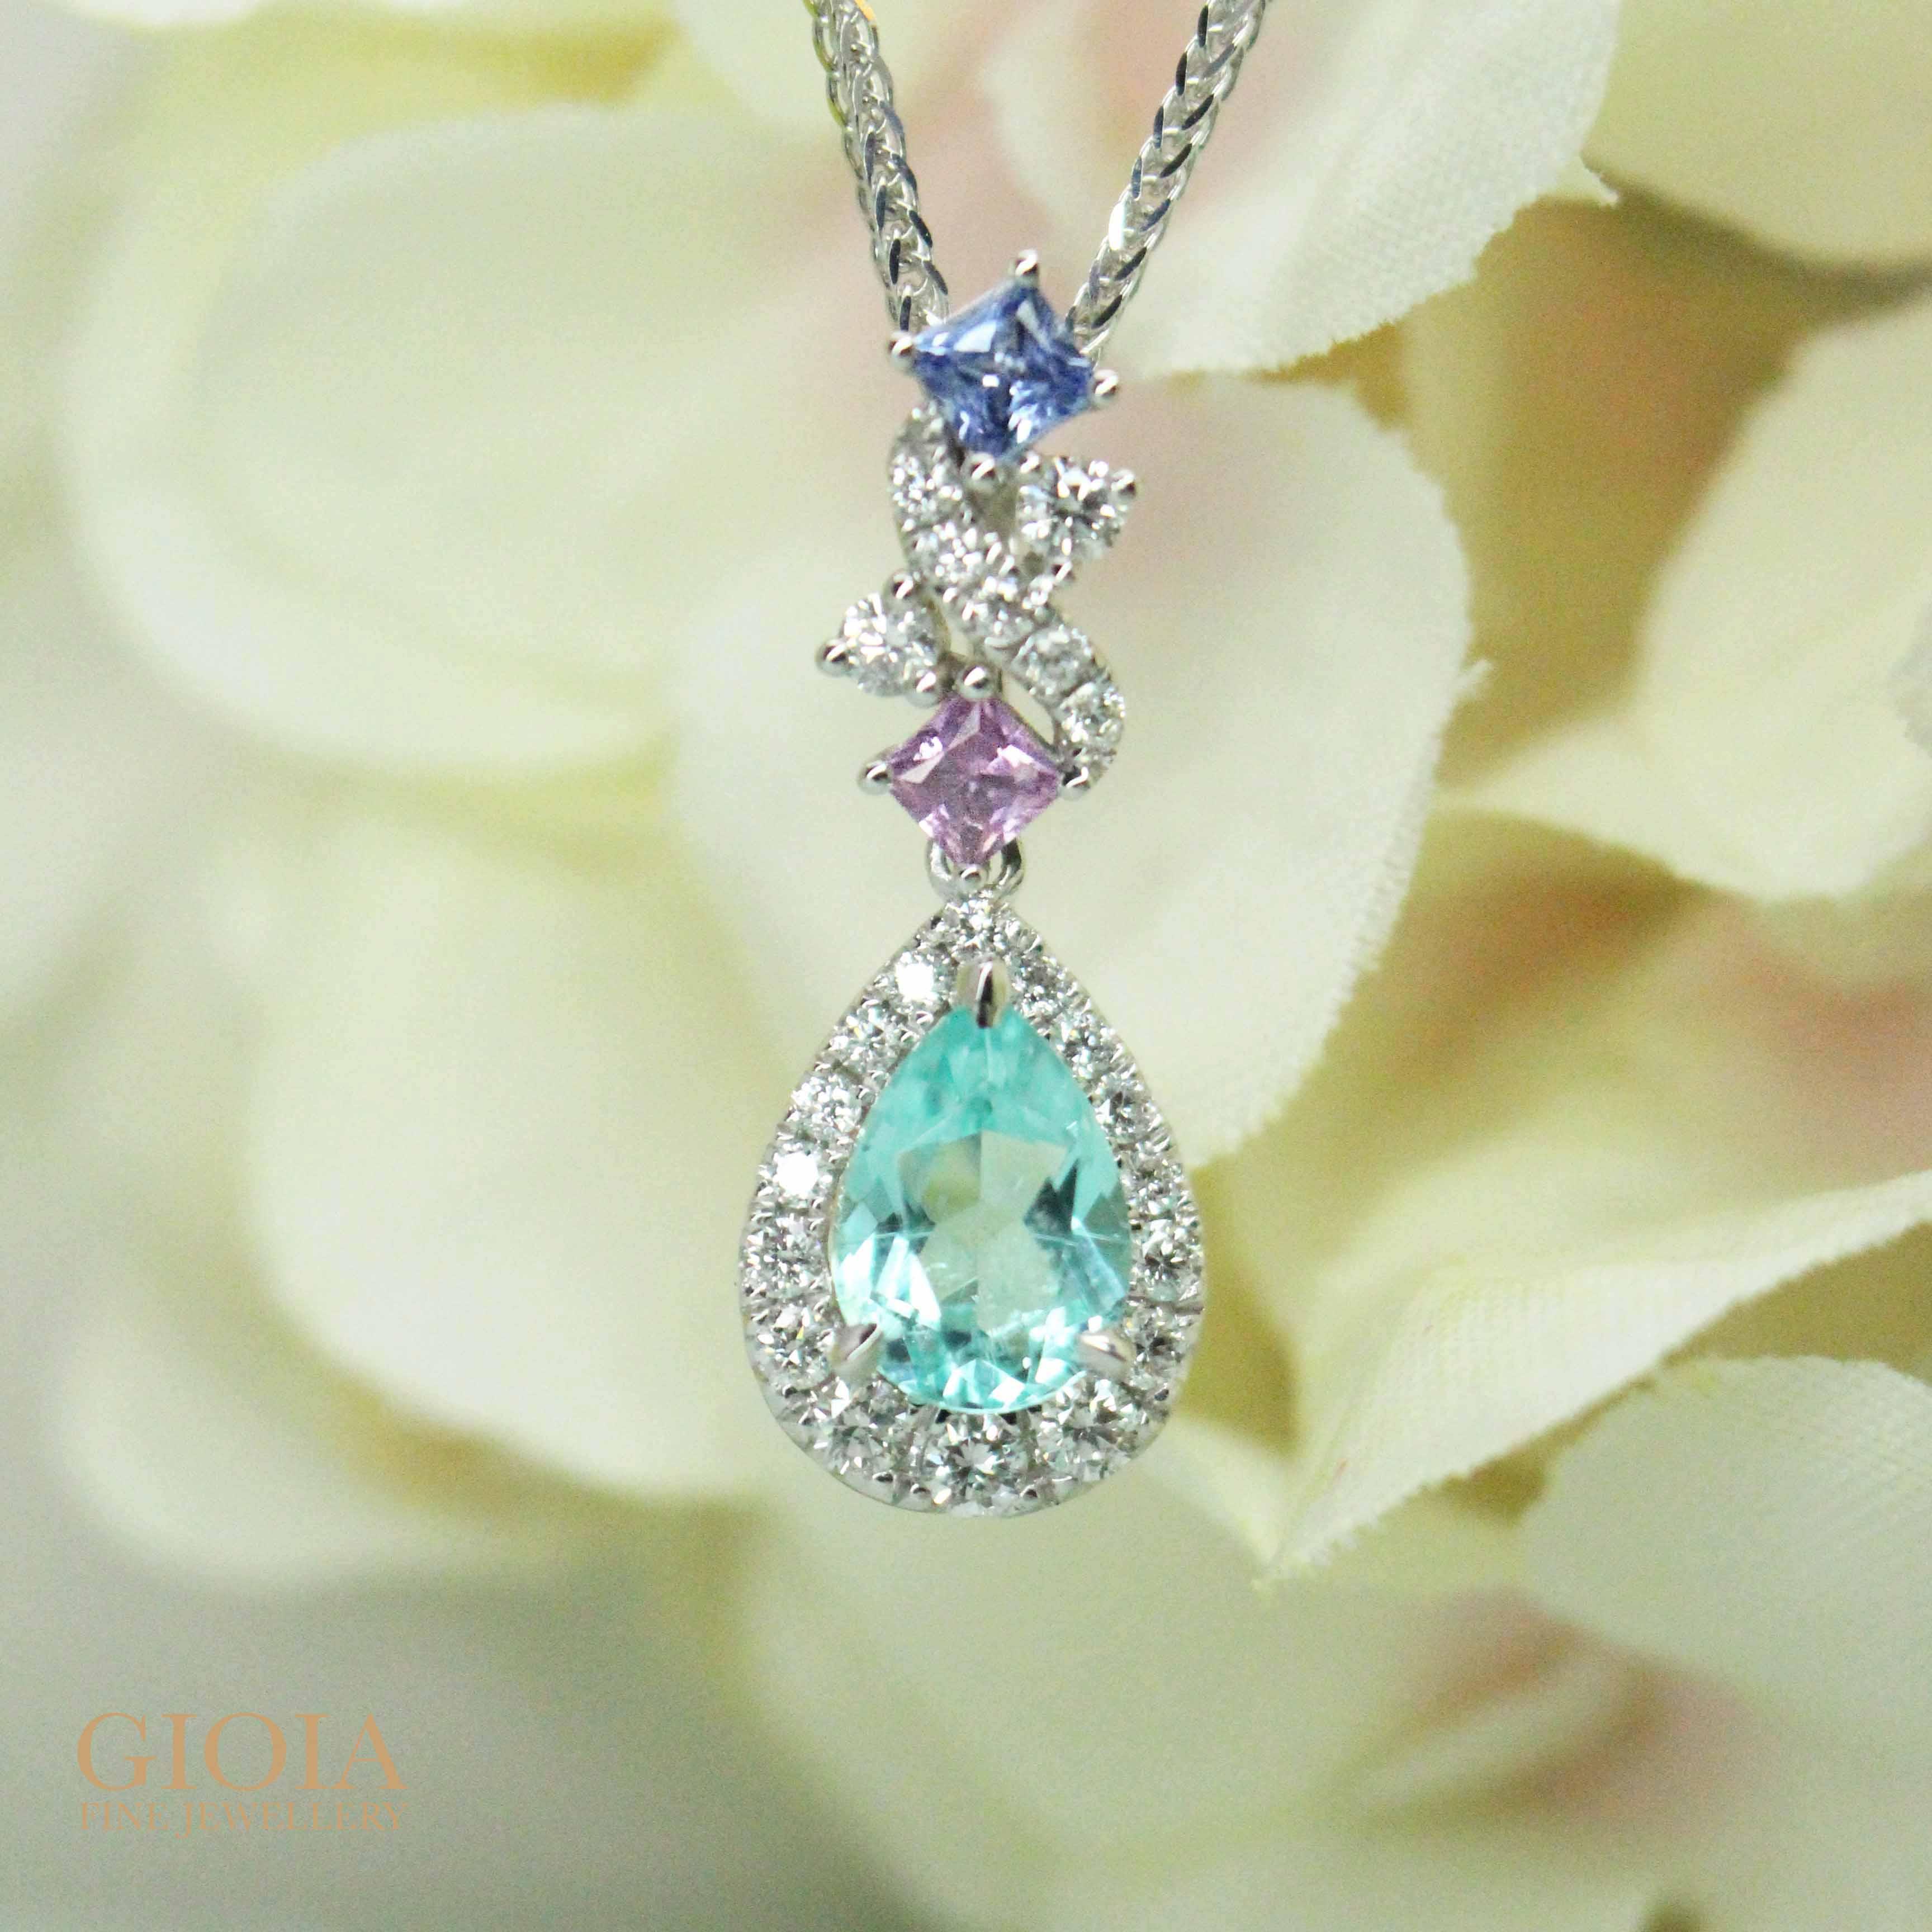 Paraiba Tourmaline with sapphire coloured gemstone Pendant | Local Singapore Customised Jeweller